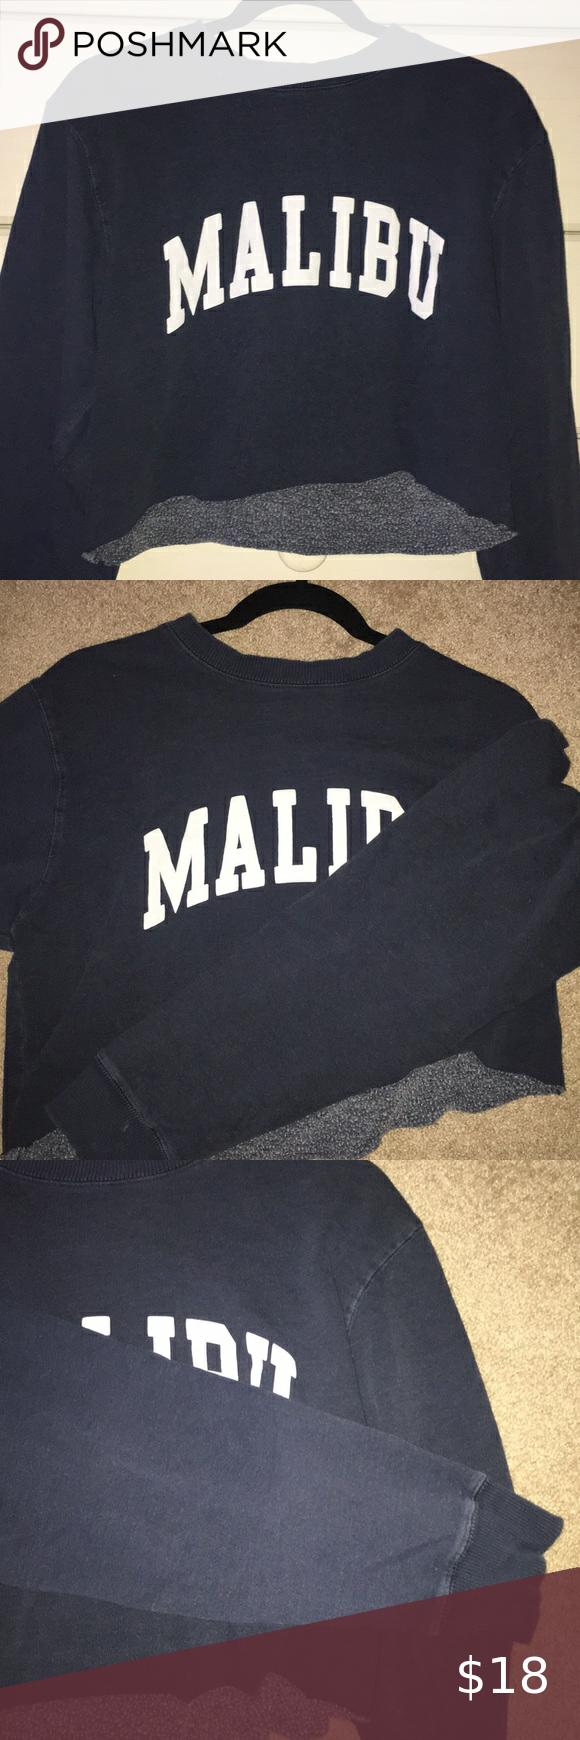 Brandy Melville Malibu Crewneck Sweatshirt Crew Neck Sweatshirt Sweatshirts Ship Clothes [ 1740 x 580 Pixel ]